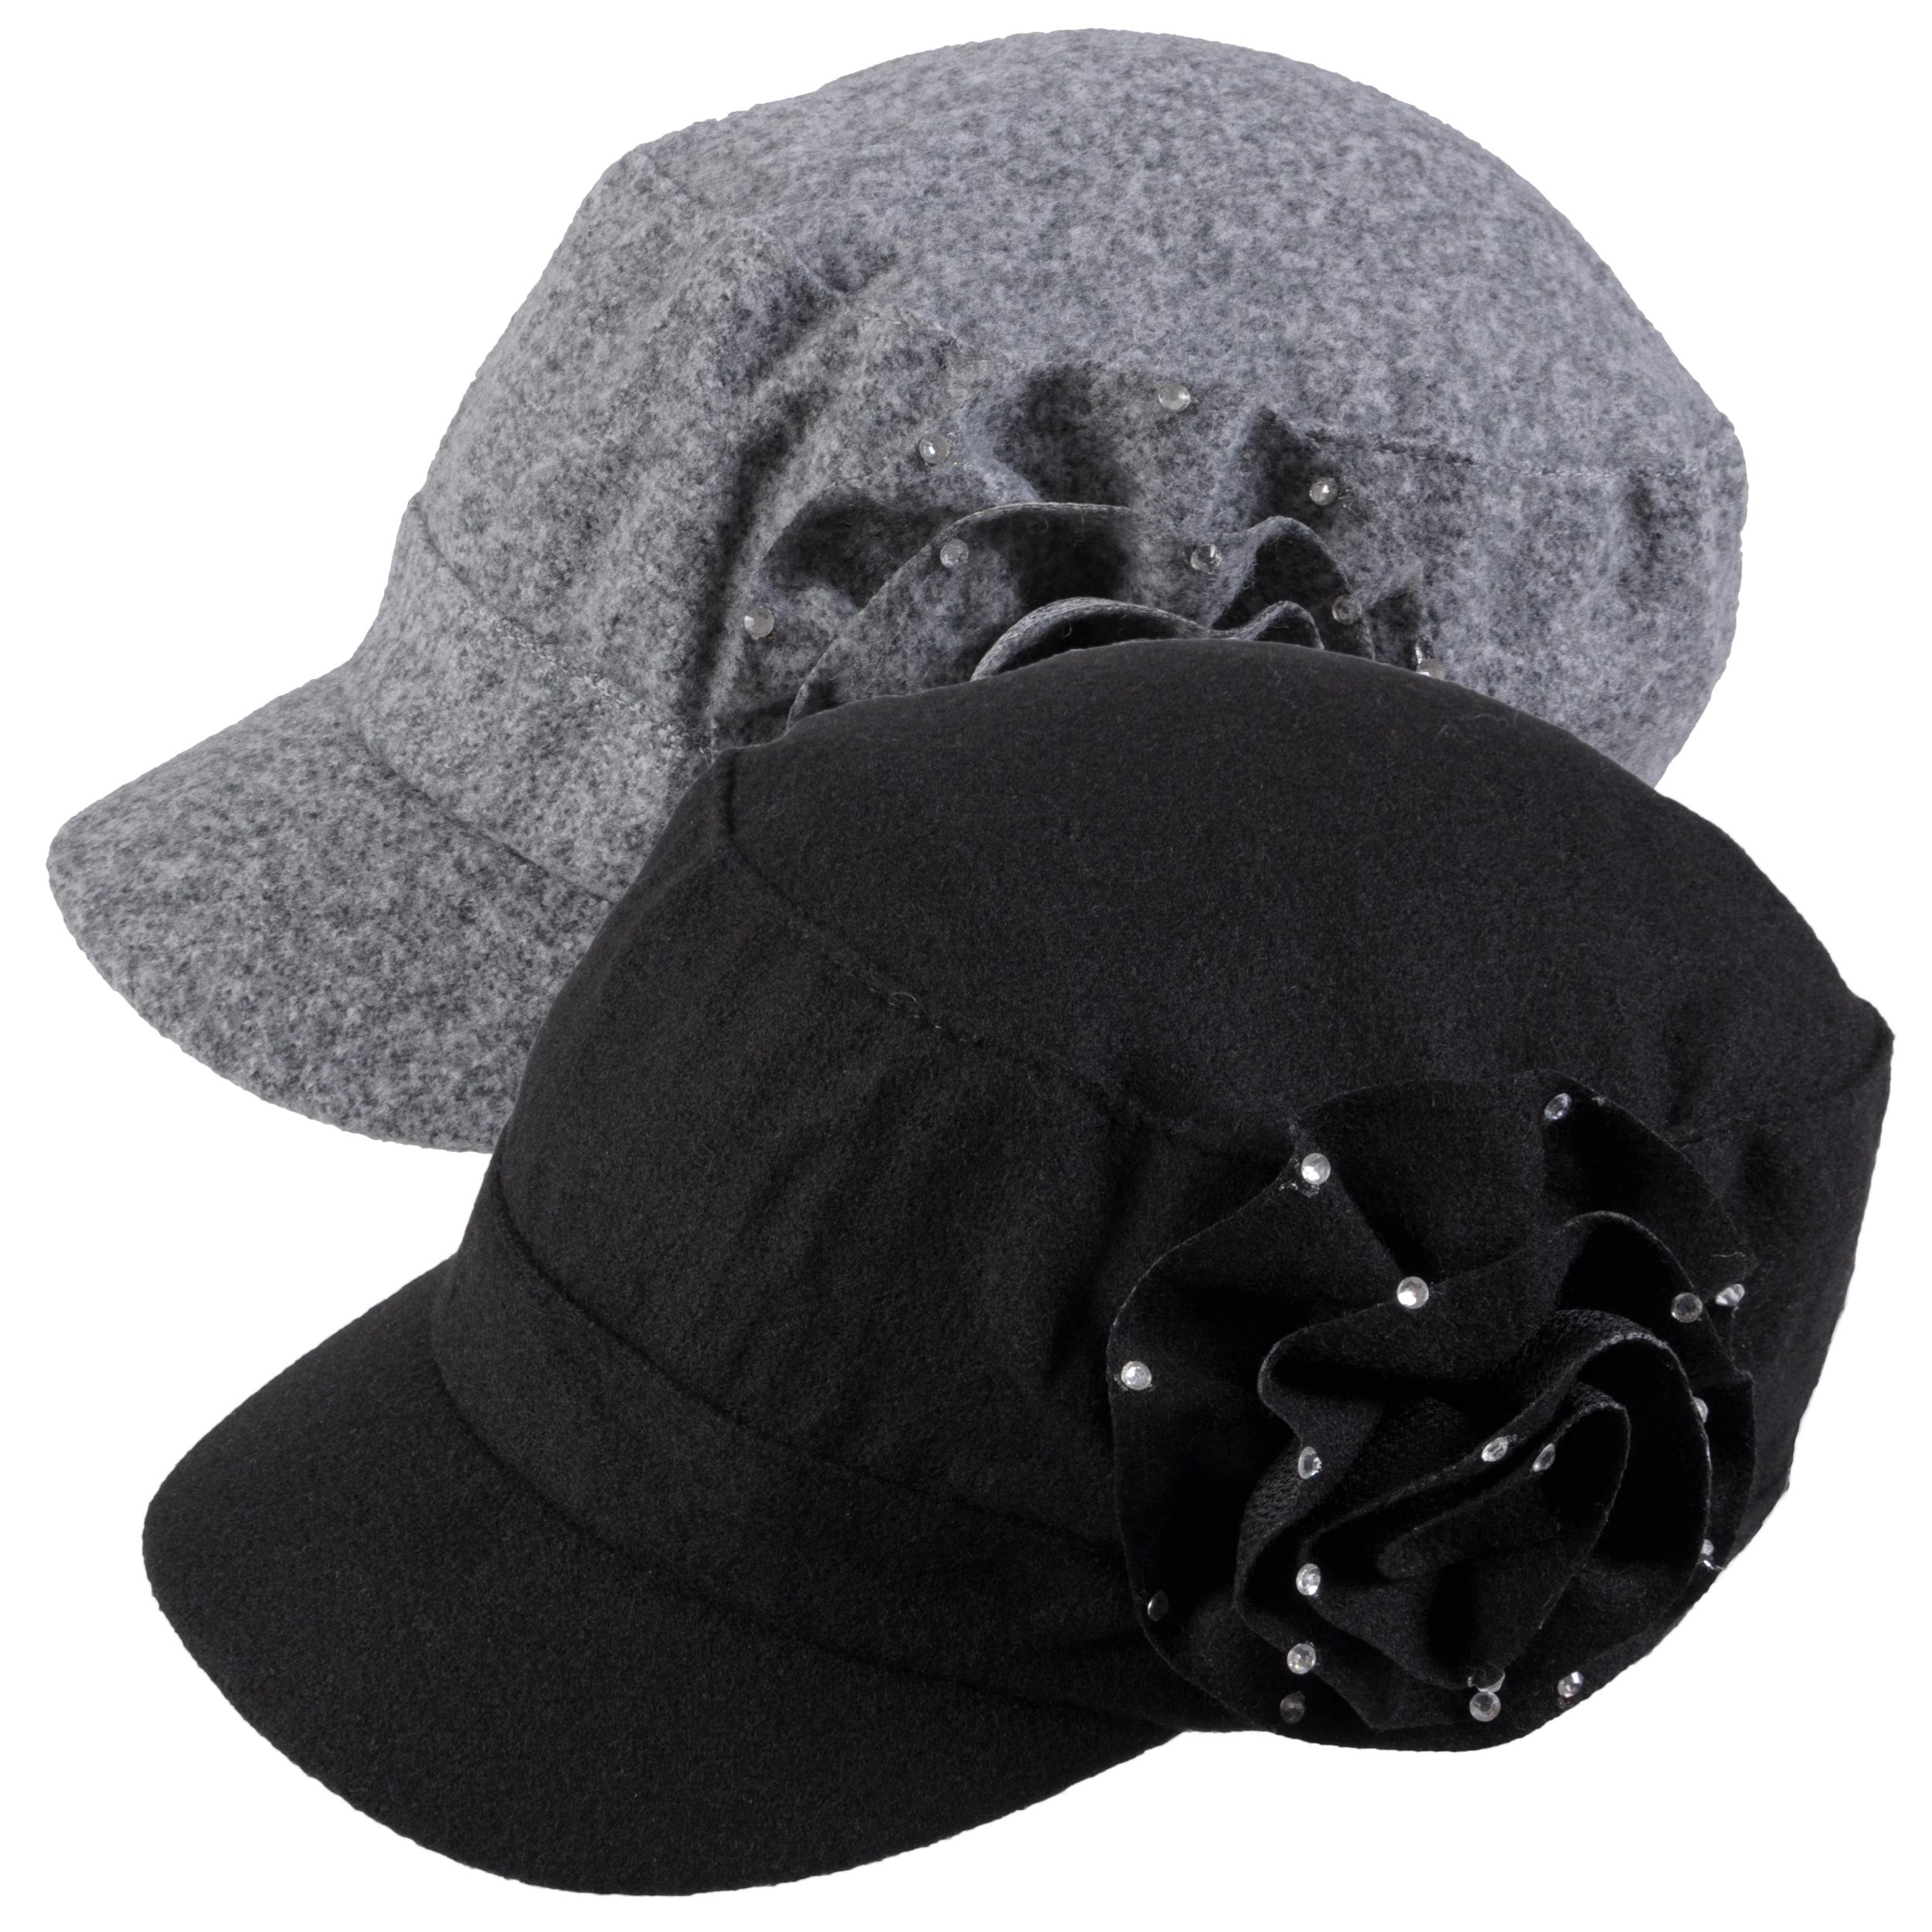 Adi Designs Women's Rosette Detail Woven Military Cap